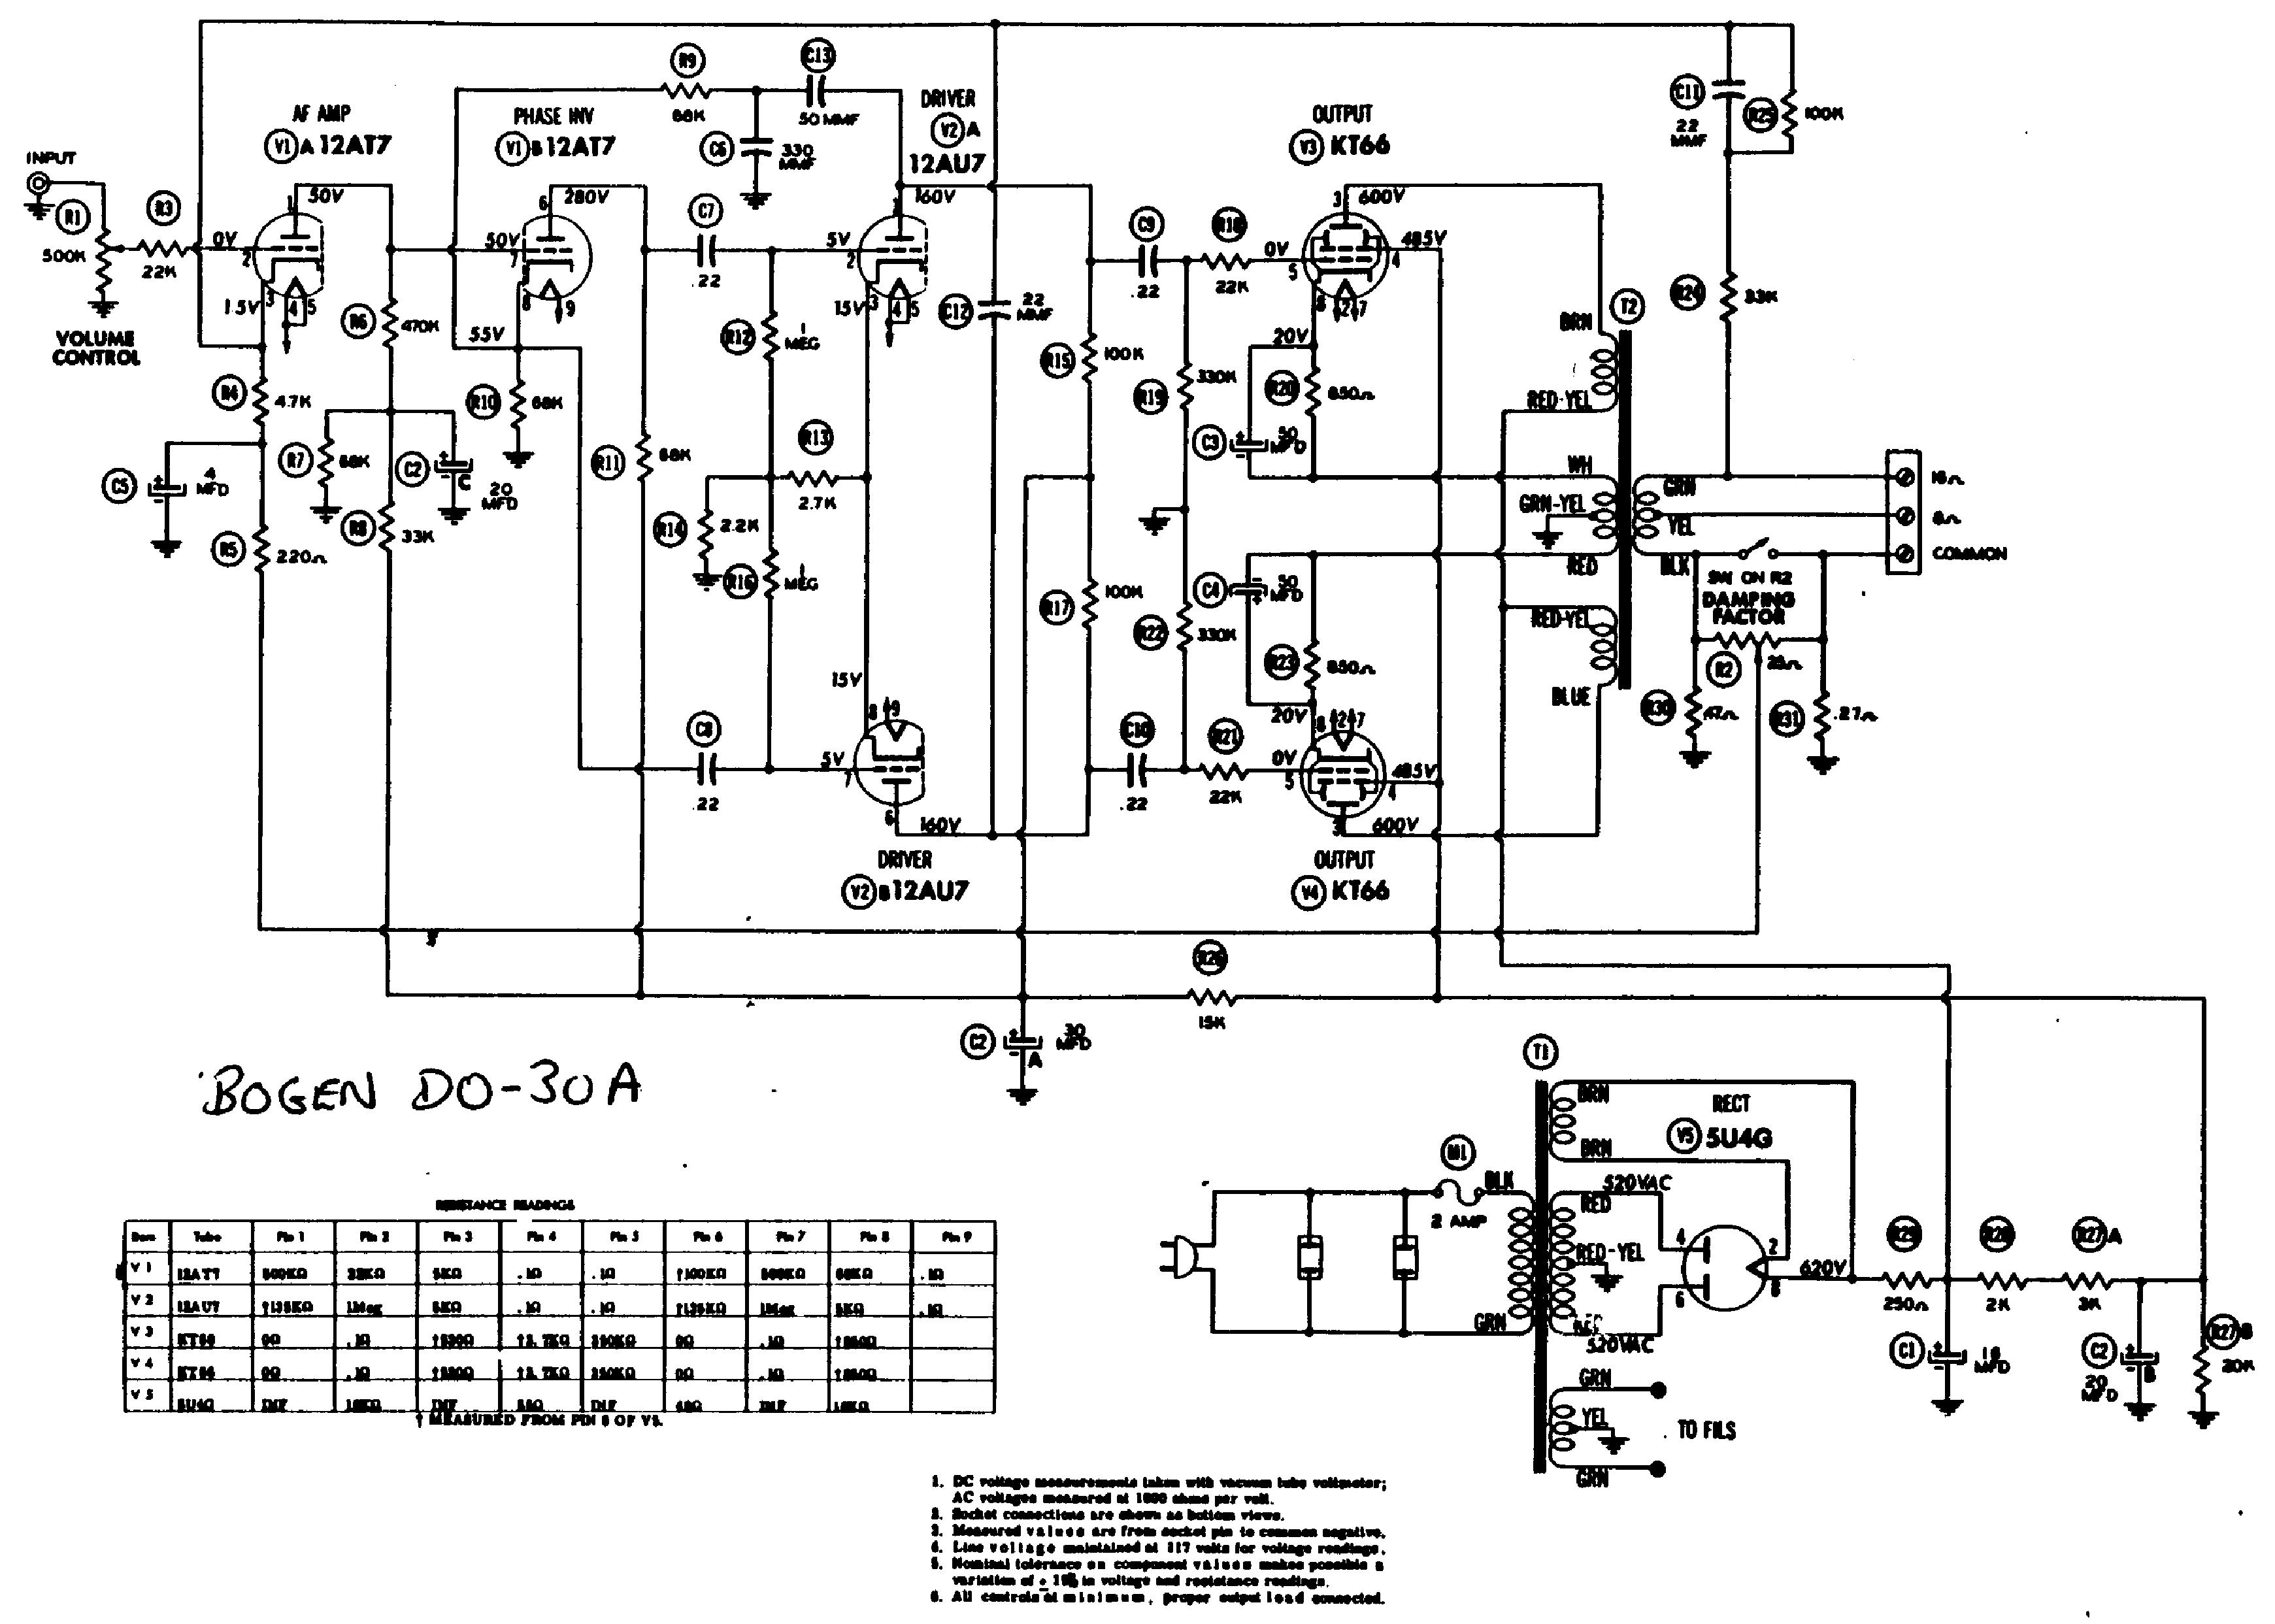 Bogen Tpu100b Troubleshooting Intercom Systems Wiring Diagram C35c C60c C100c Sm Service Manual Download Schematics Eeprom Rh Elektrotanya Com C100